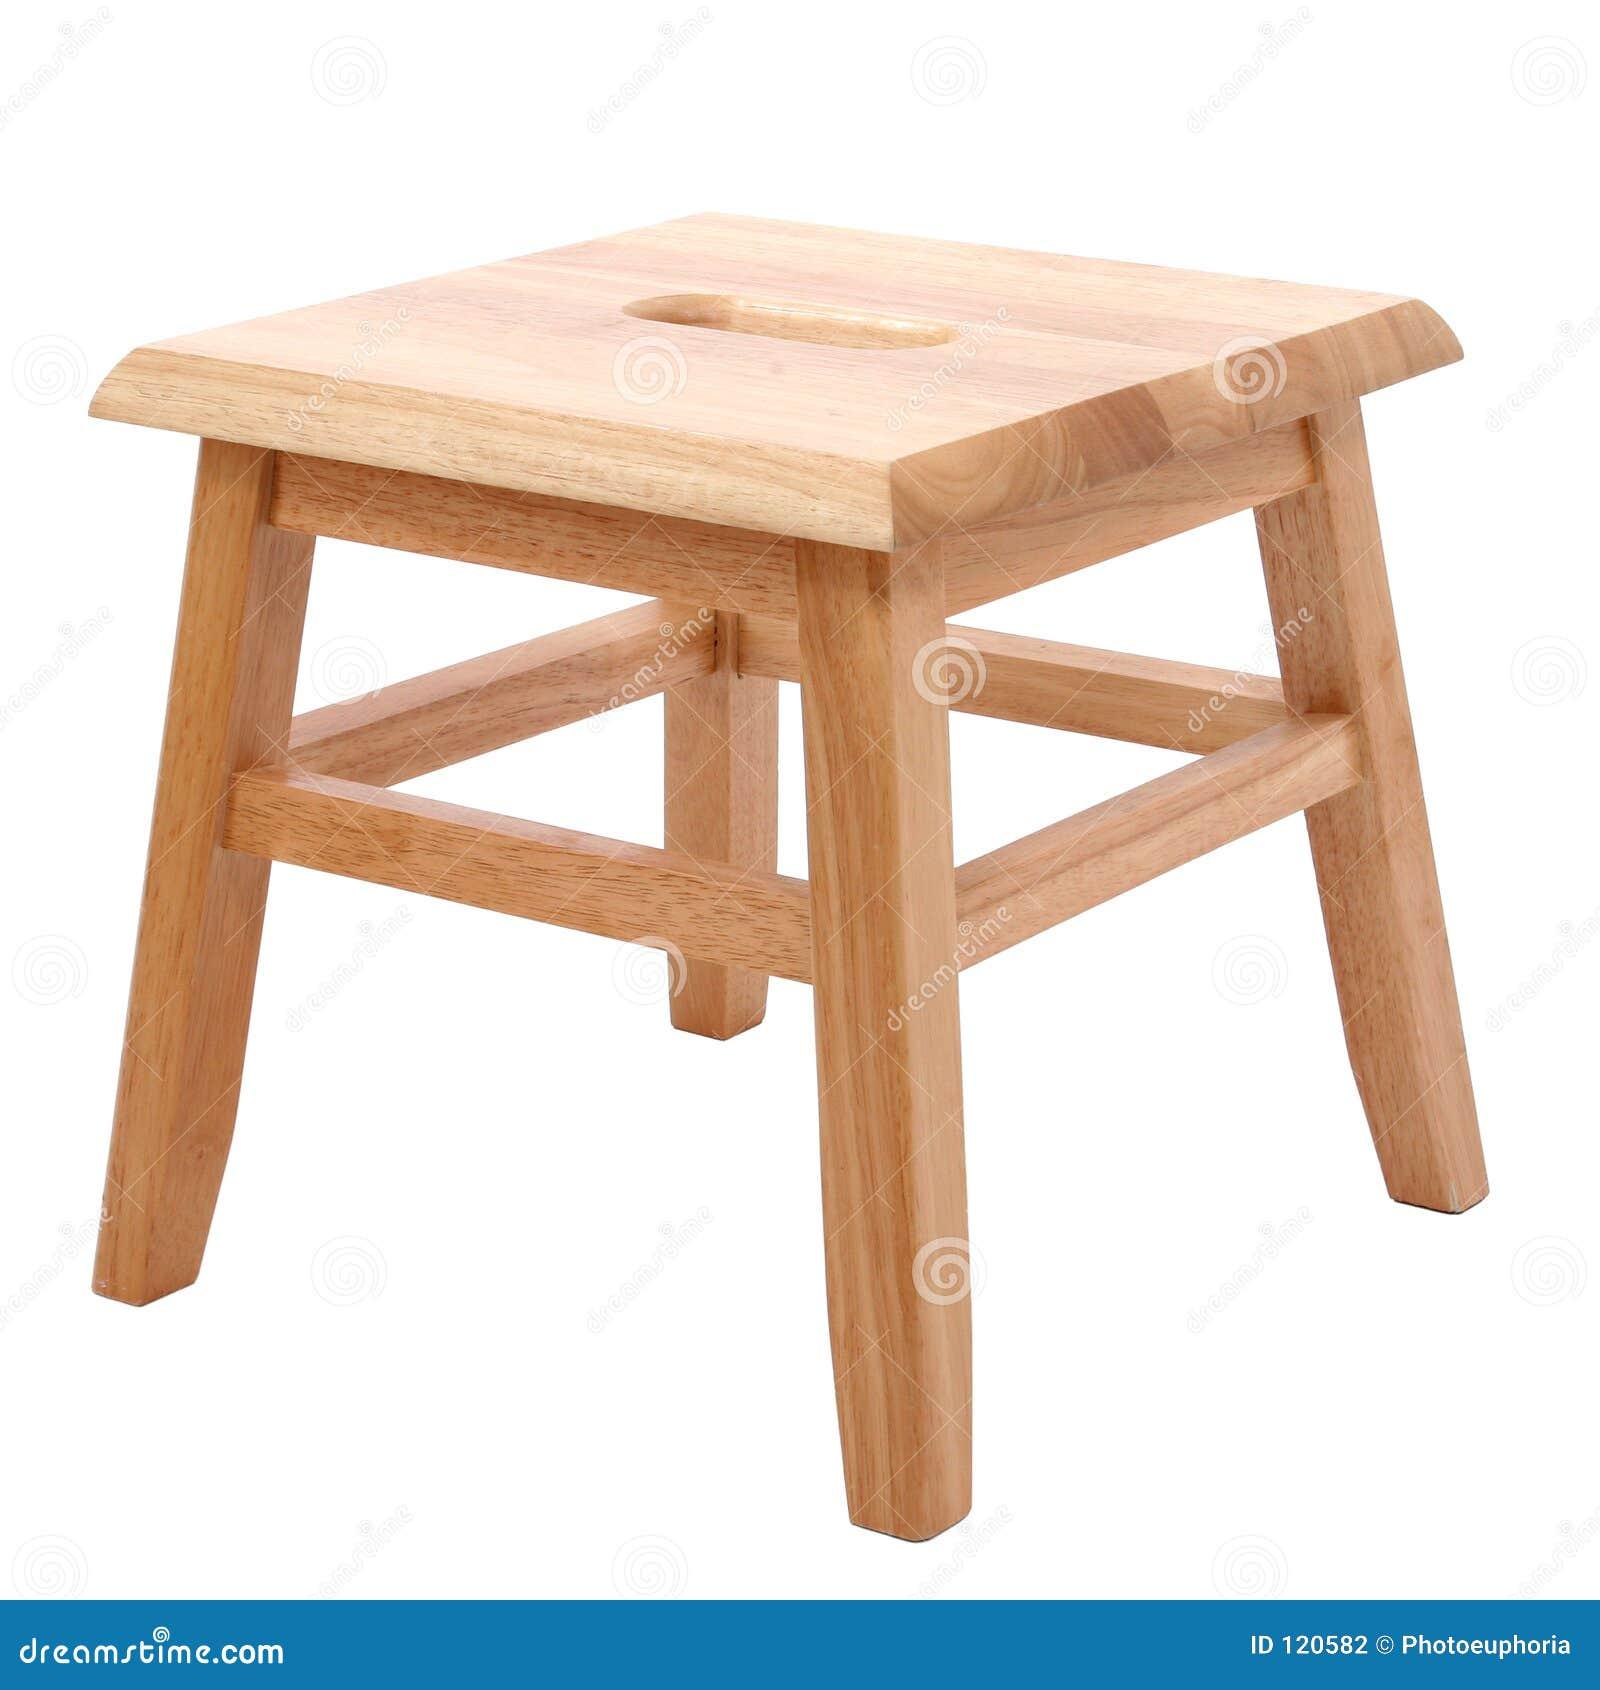 tabouret en bois au dessus de blanc photographie stock image 120582. Black Bedroom Furniture Sets. Home Design Ideas